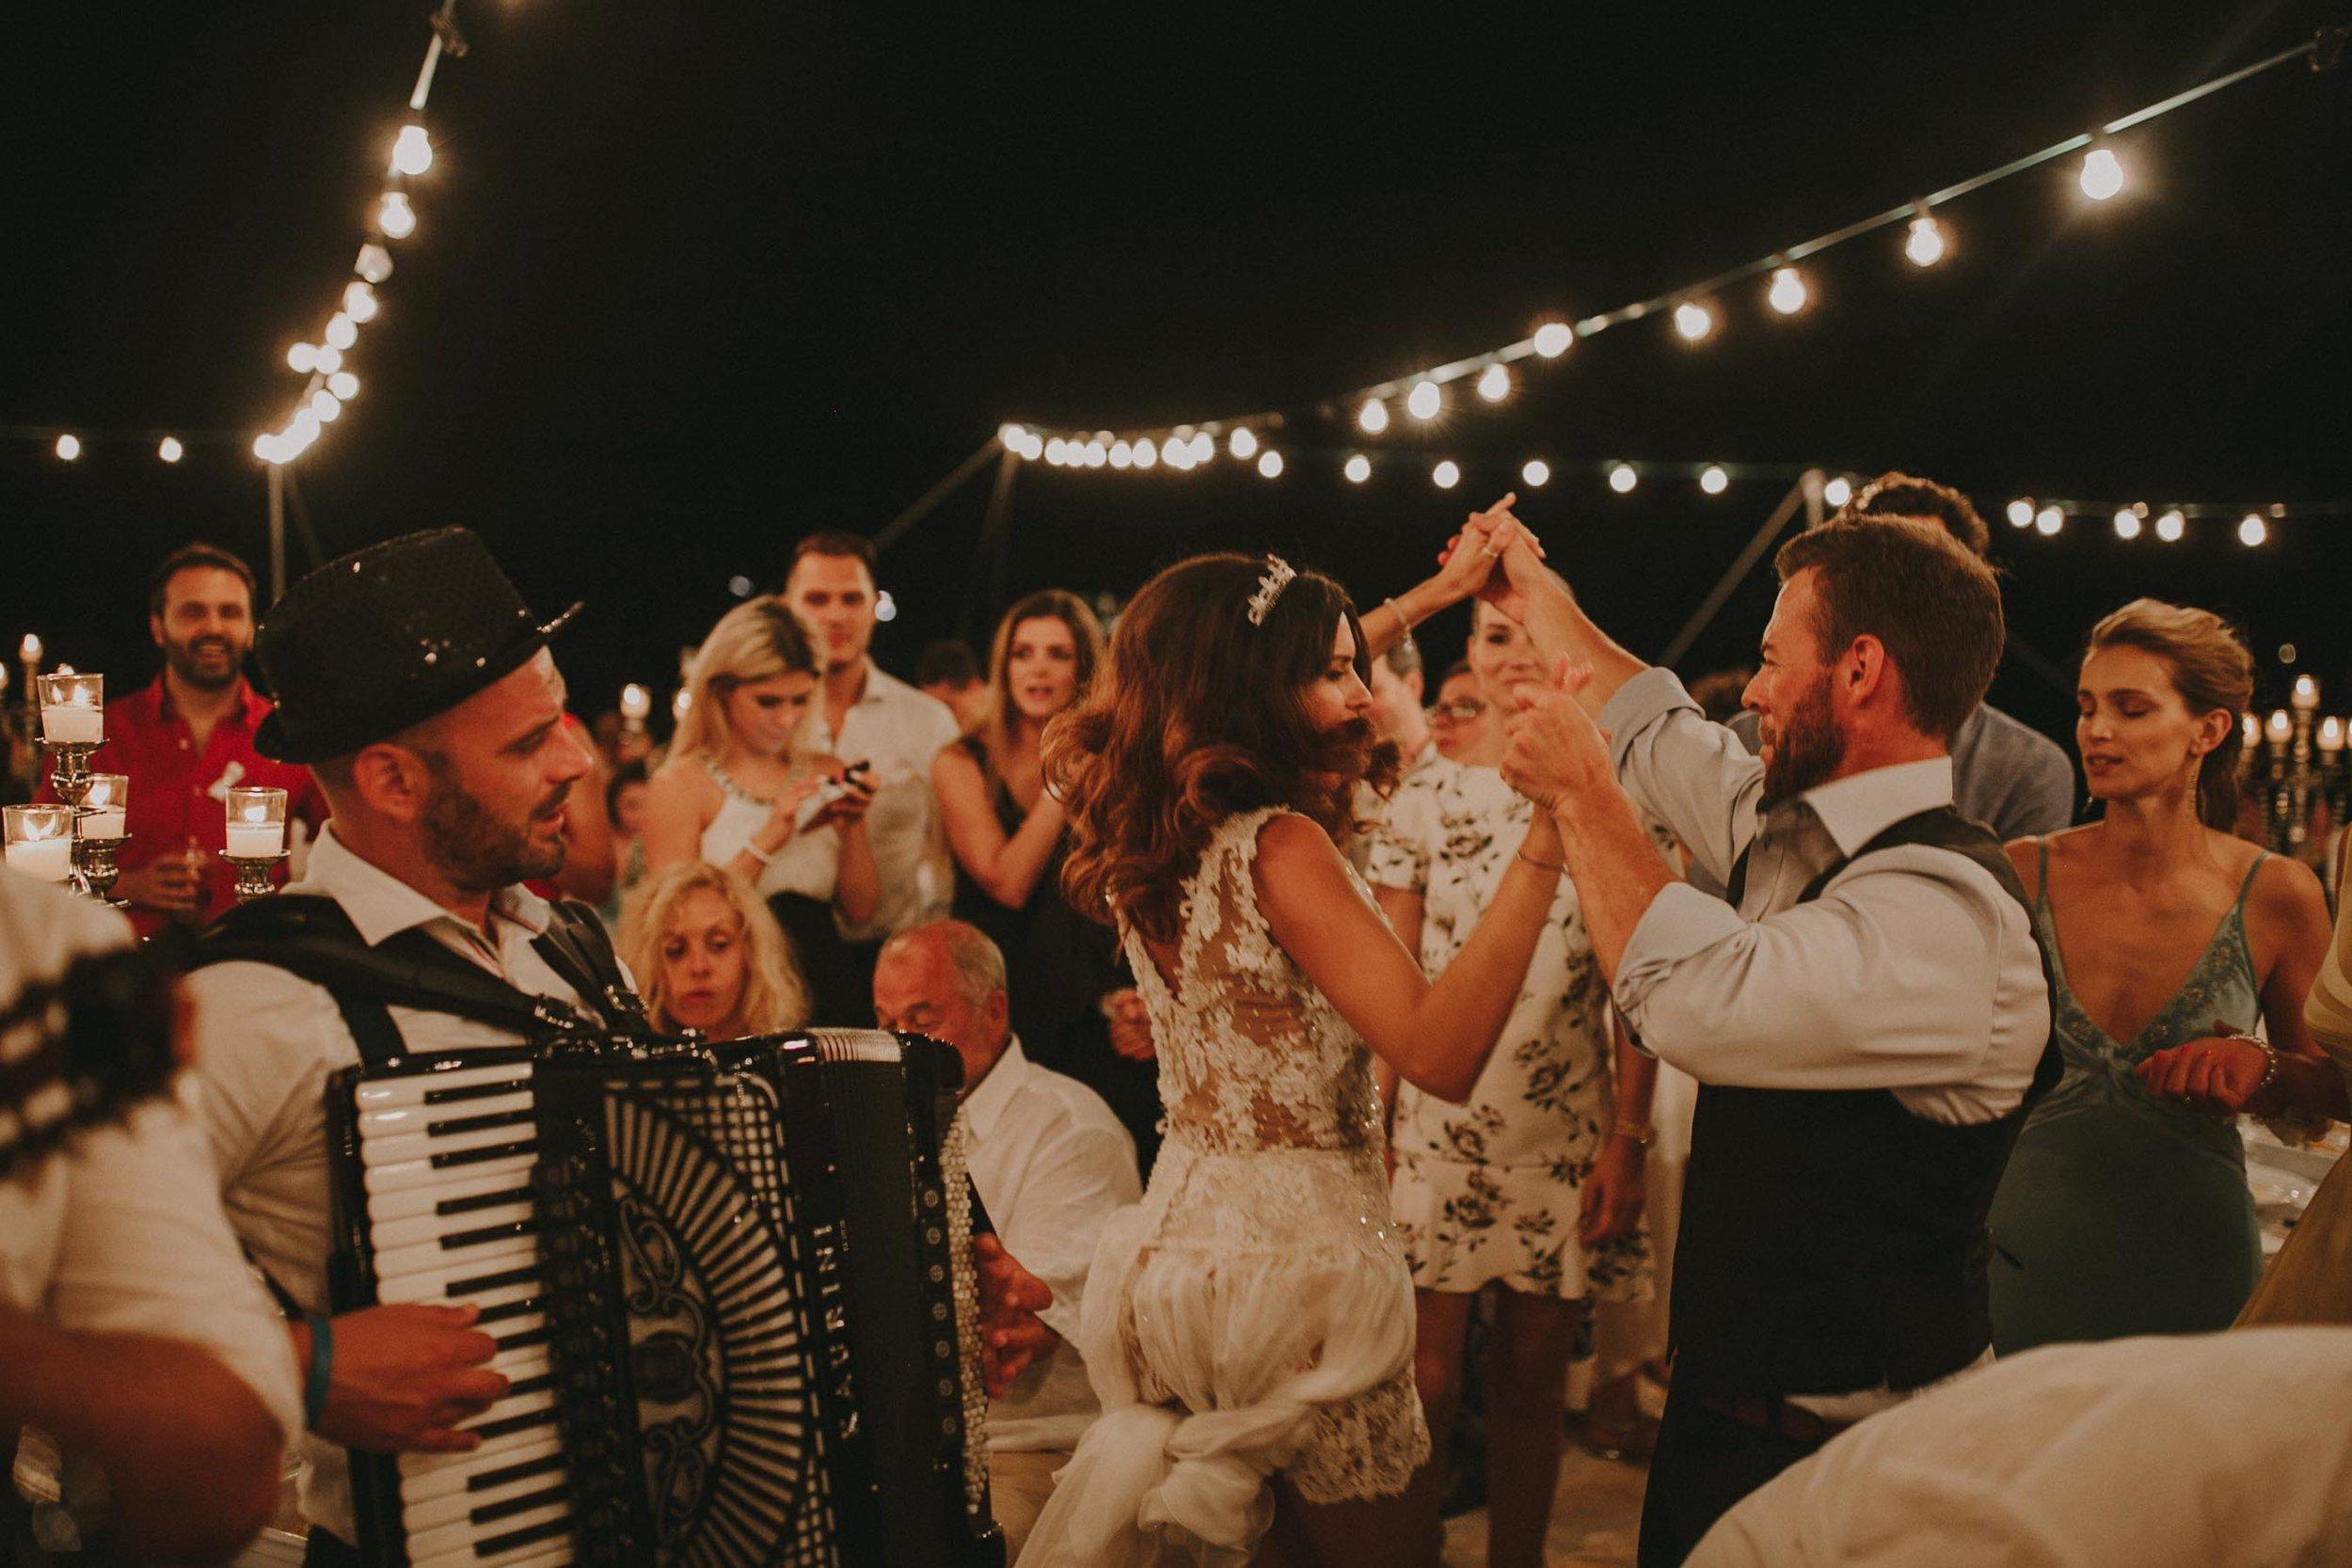 sylvia&dimitri-Wedding-Crvena_Luka-Croatia-117(7104).jpg